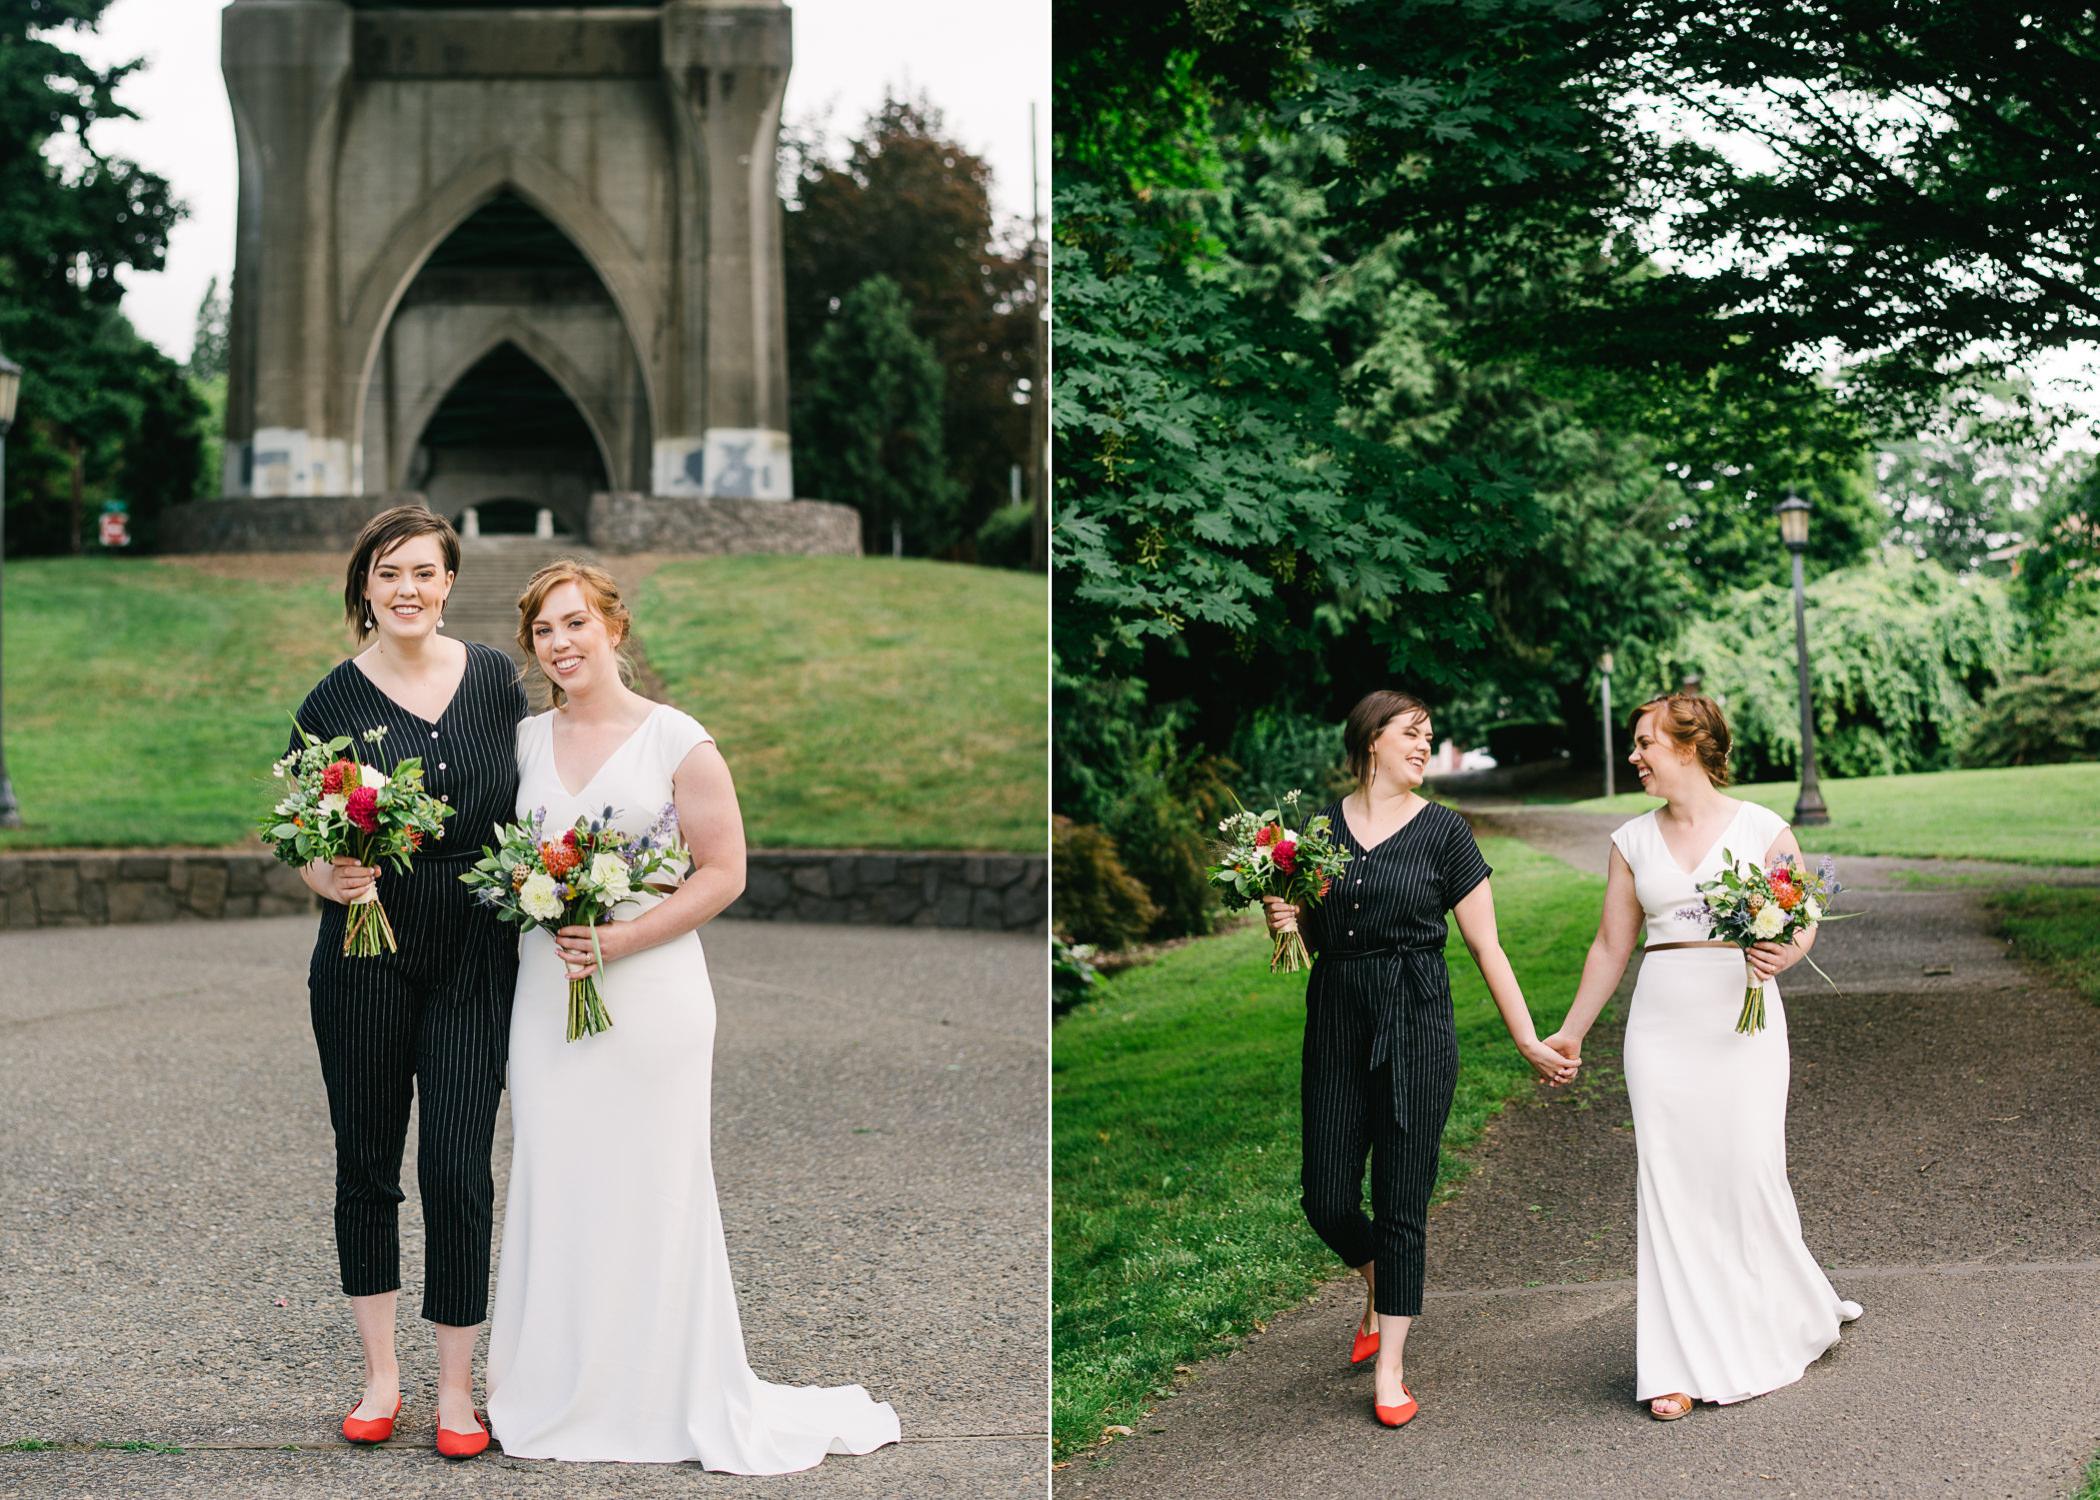 cathedral-park-portland-elopement-gay-wedding-042.JPG